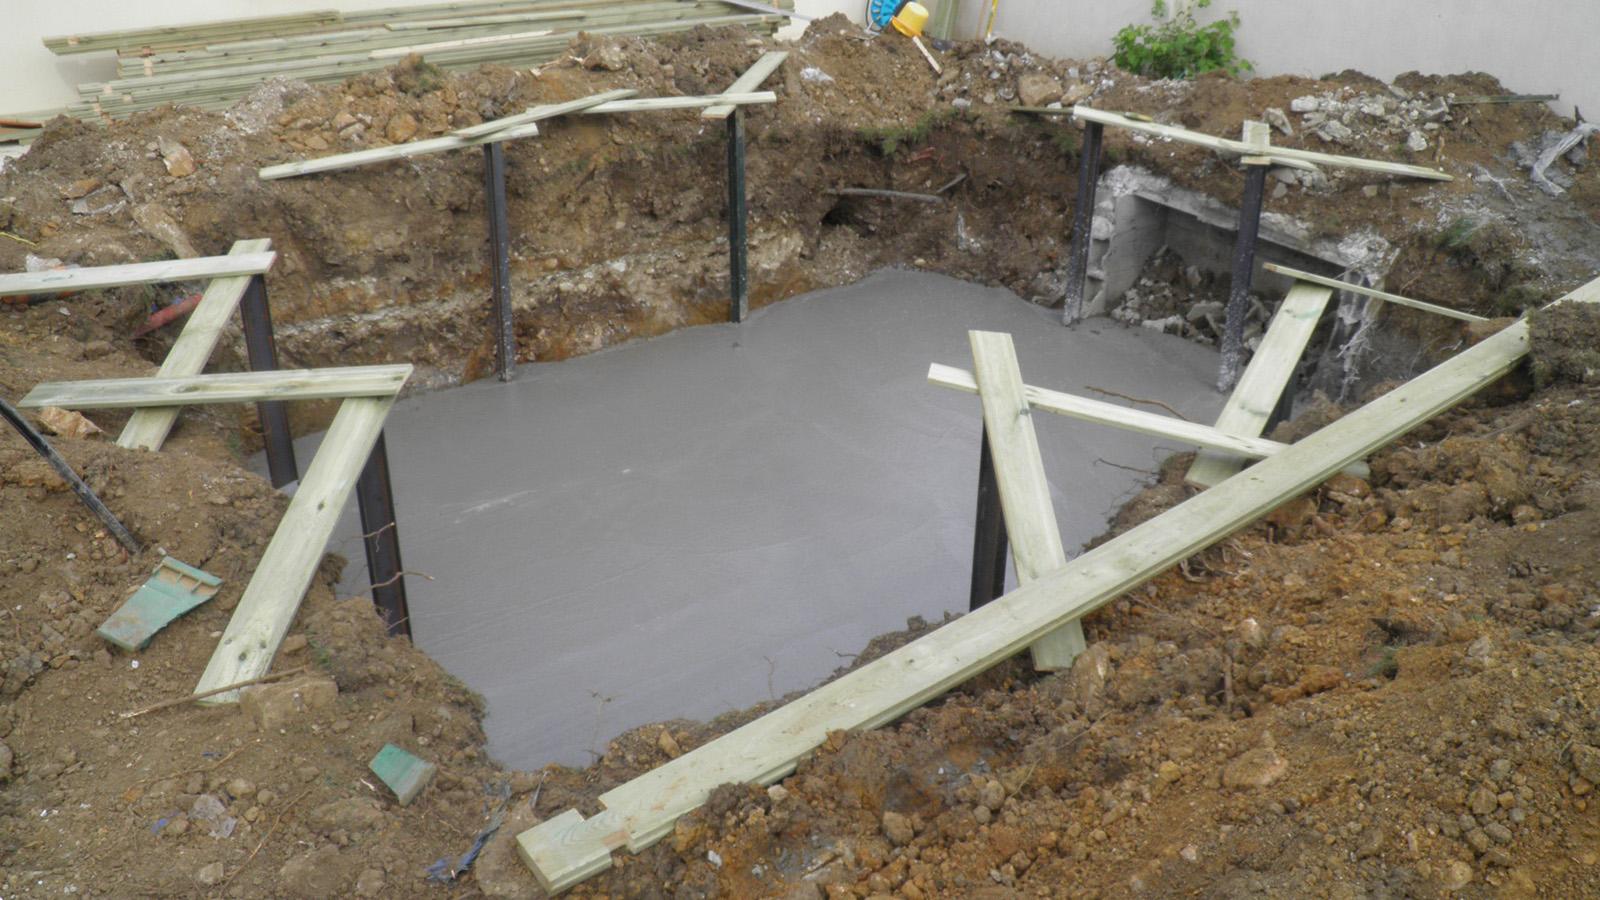 construire une piscine bois semi enterr e jardin piscine et cabane. Black Bedroom Furniture Sets. Home Design Ideas